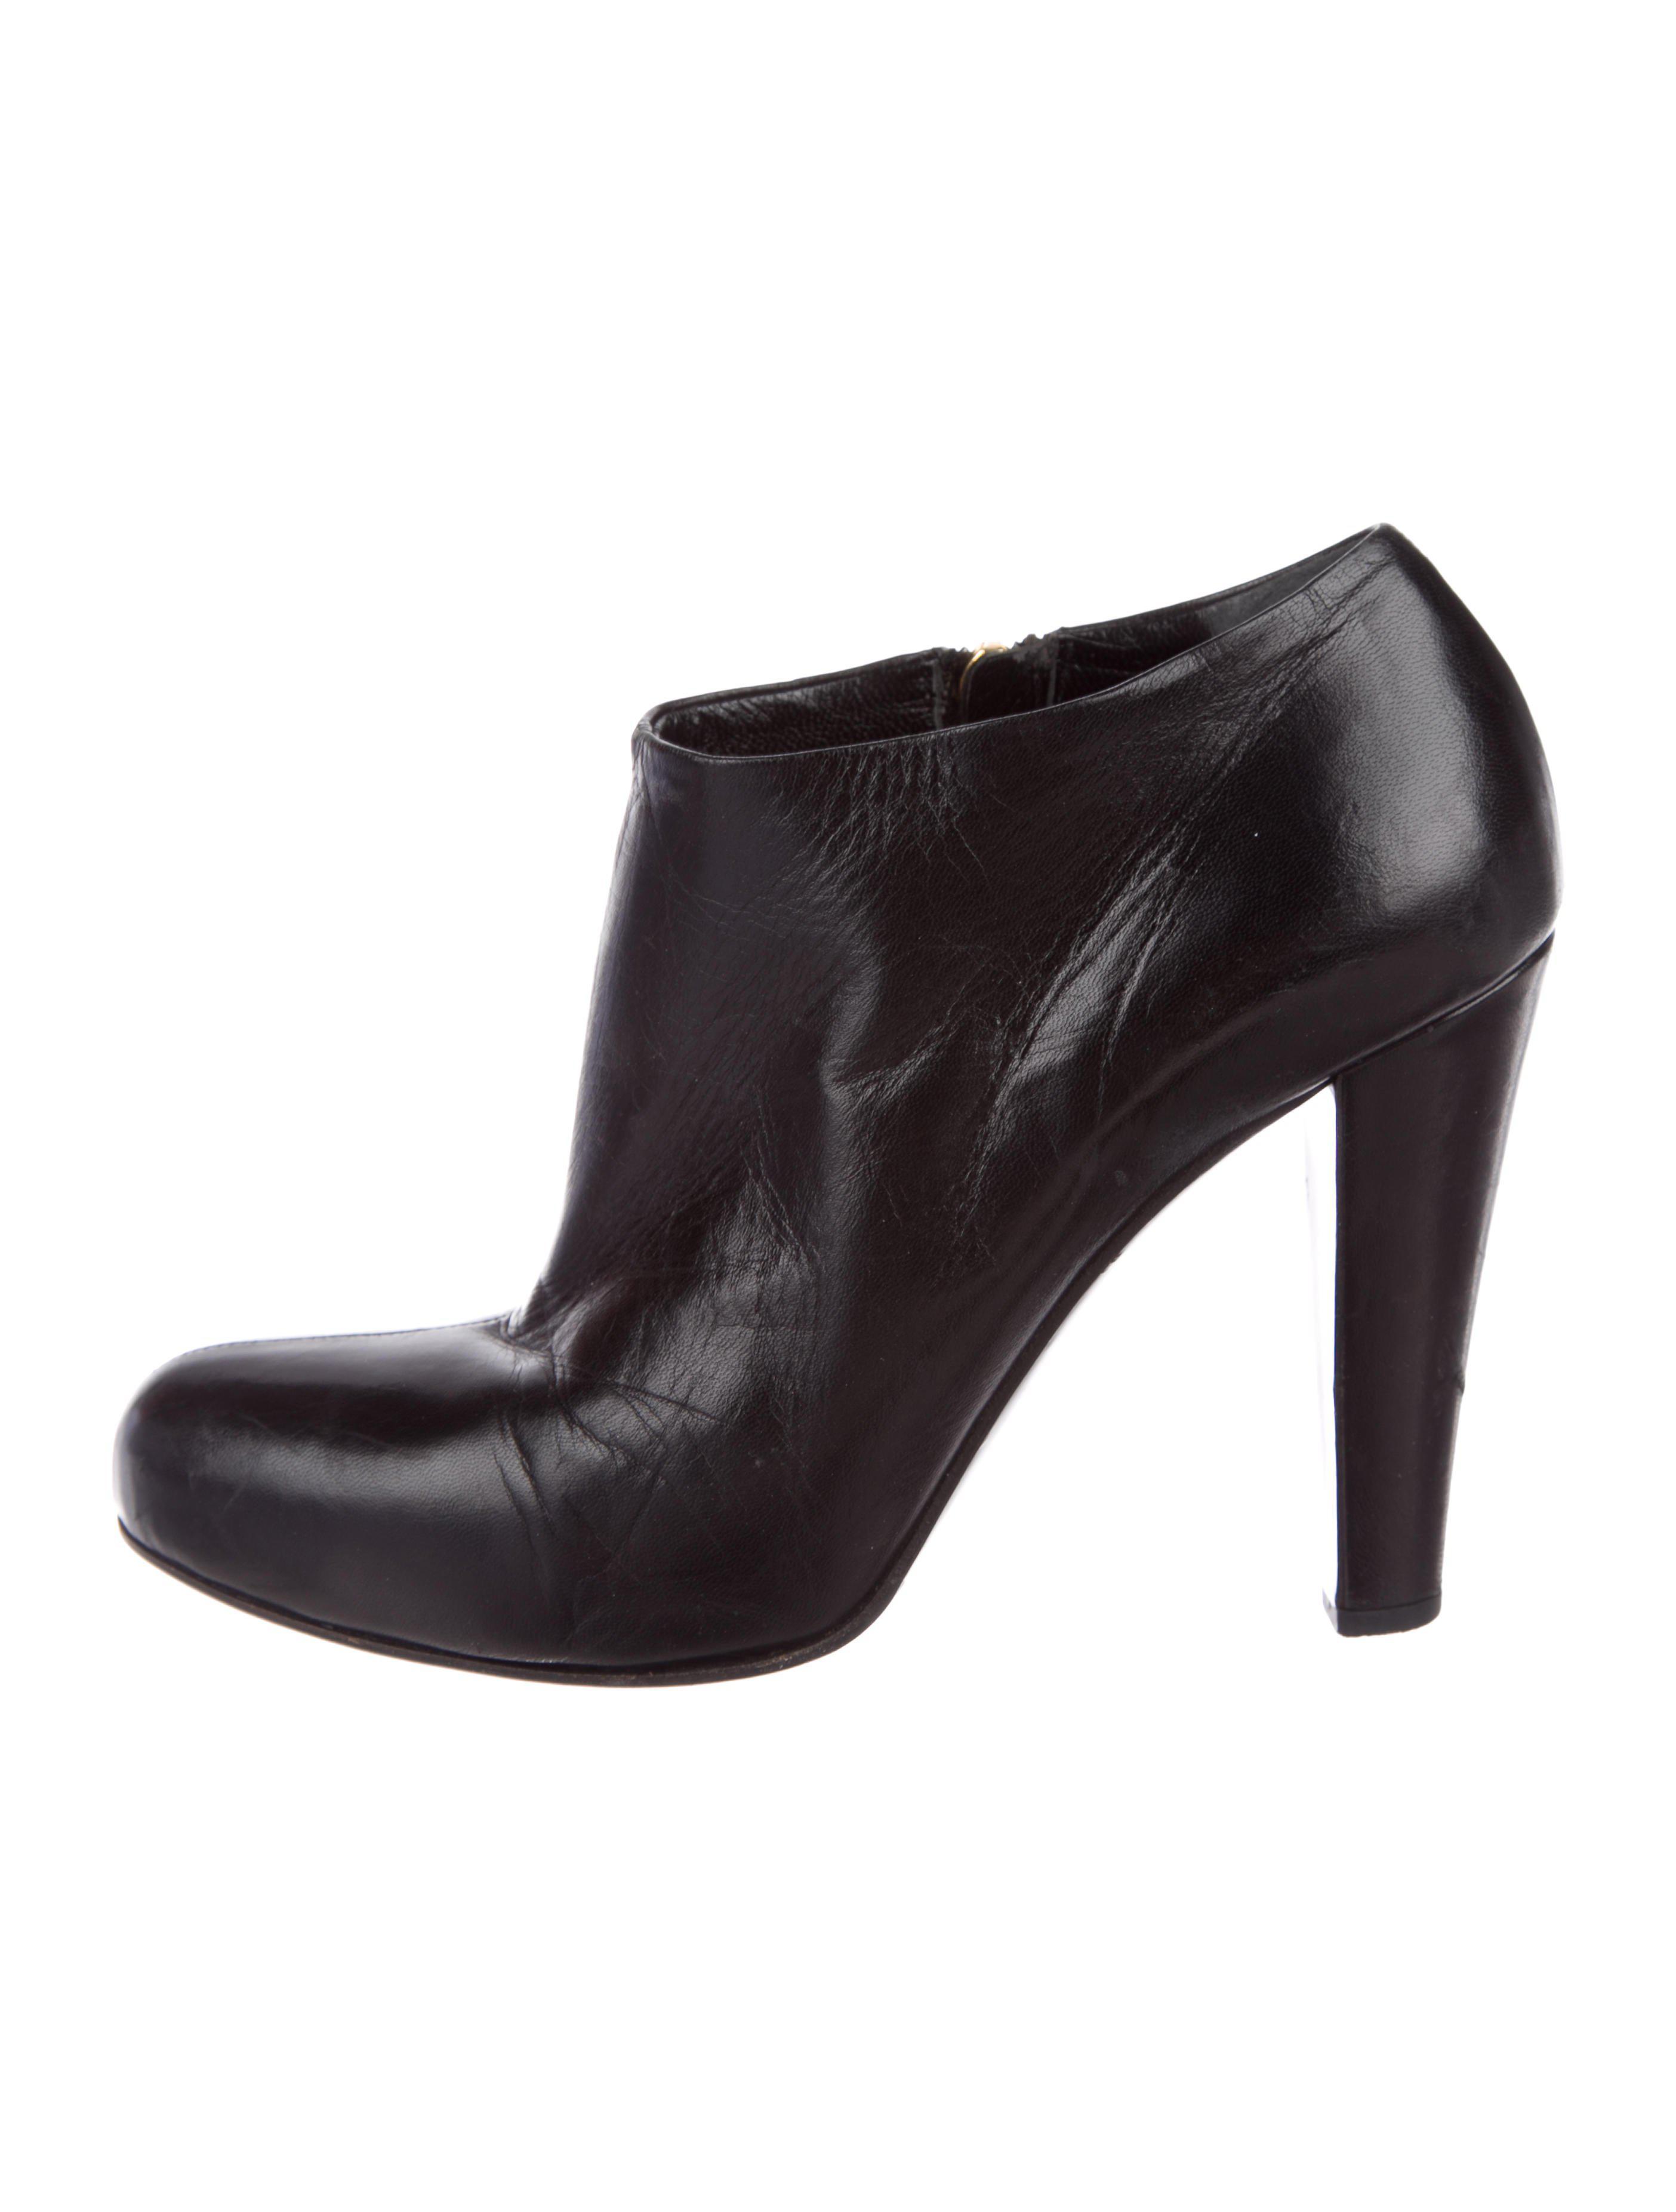 Miu Miu Round-Toe Leather Booties cheap discount sale pRnhS